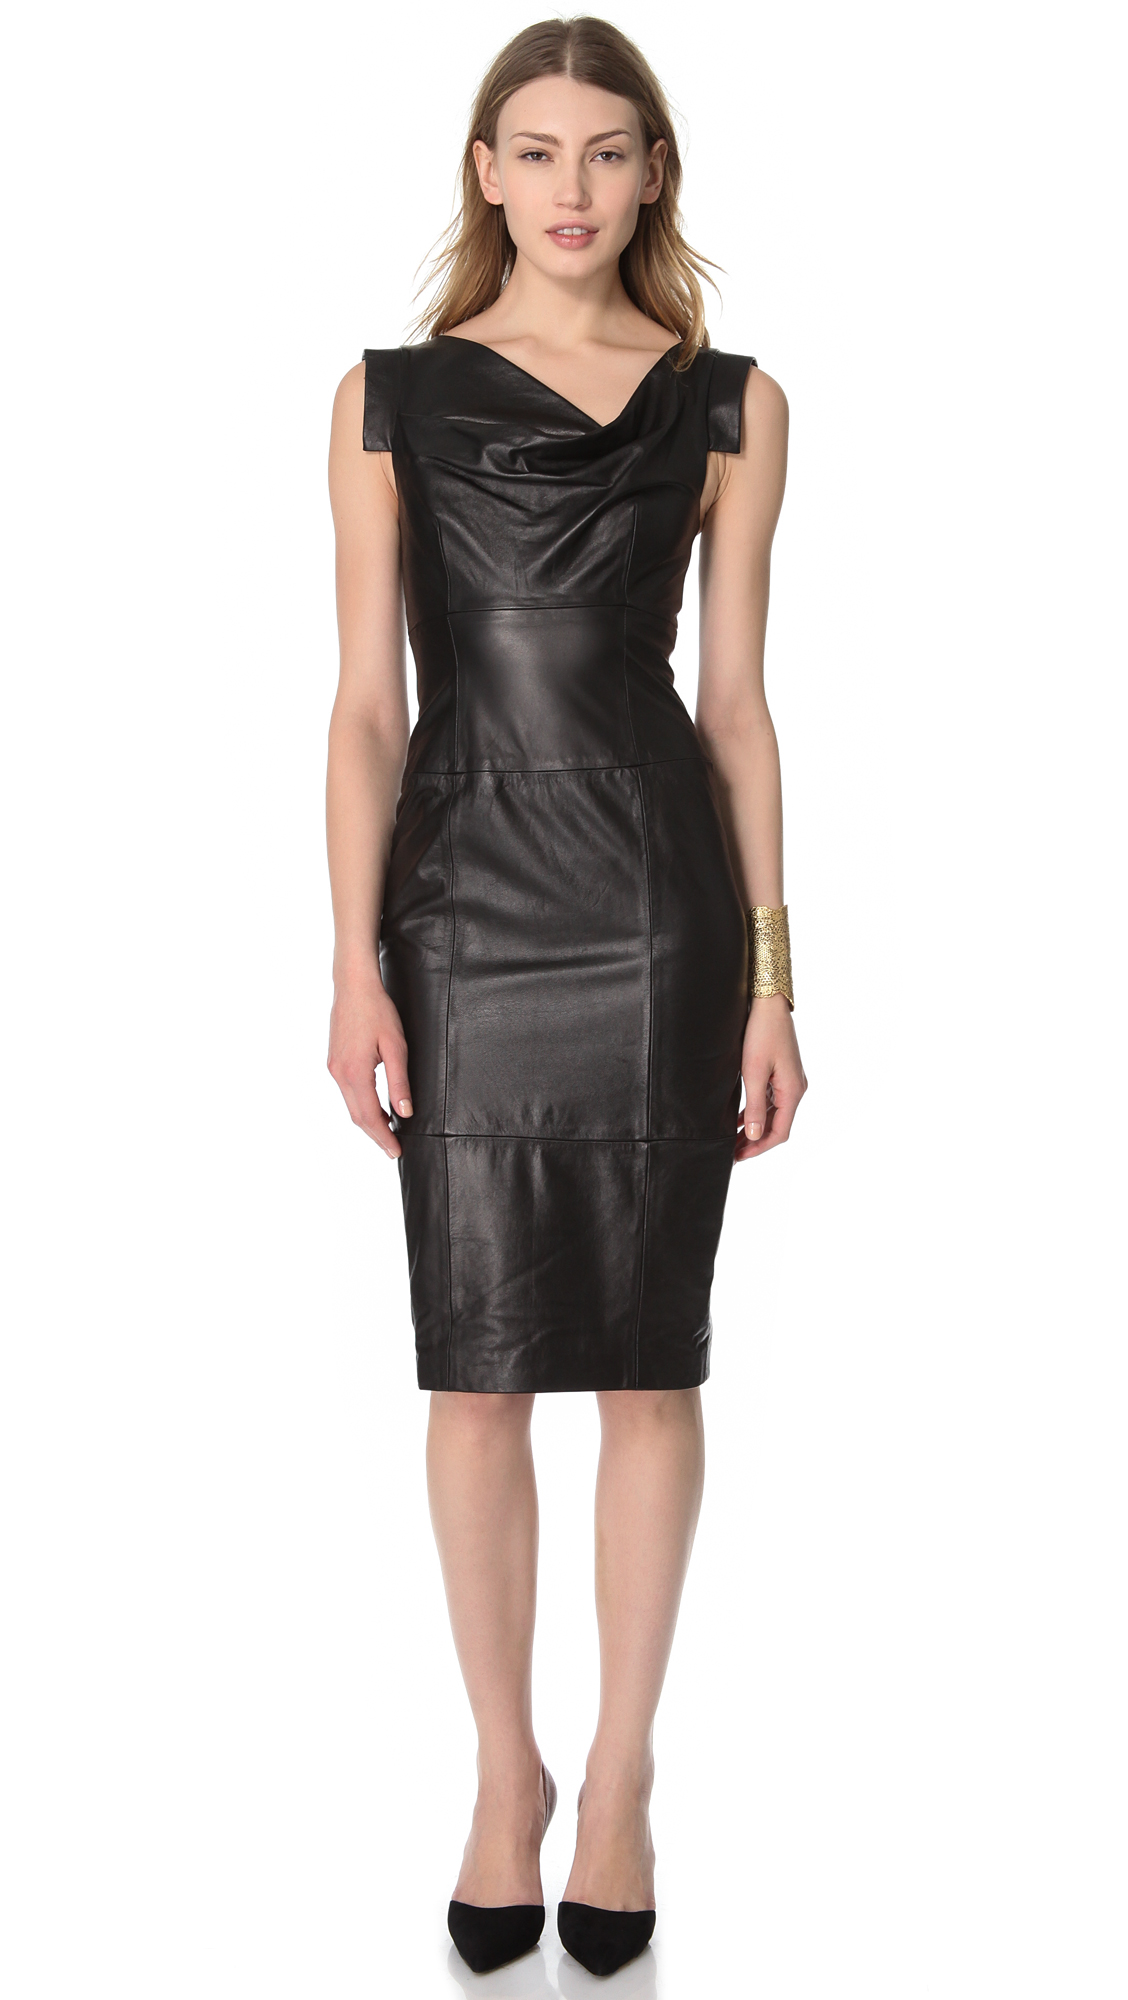 Lyst - Black Halo Leather Jackie O Dress In Black